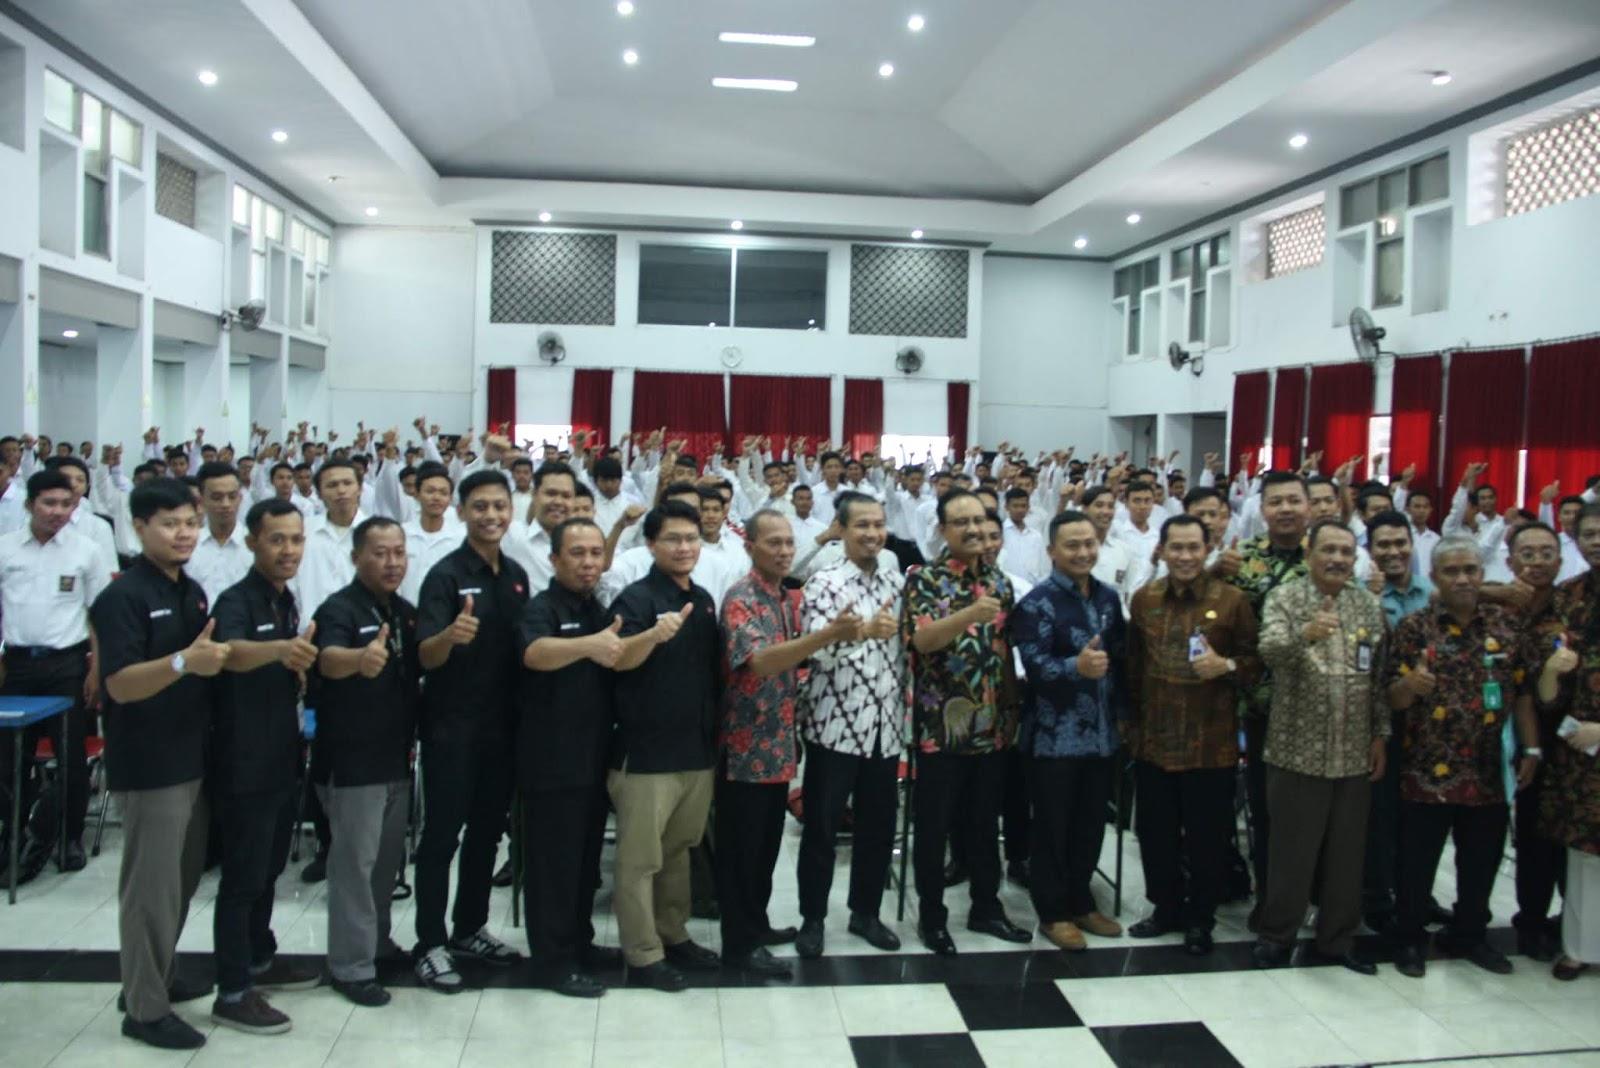 Lowongan Kerja Operator Produksi SMA SMK/SMU 2019 PT.Astra Daihatsu Motor